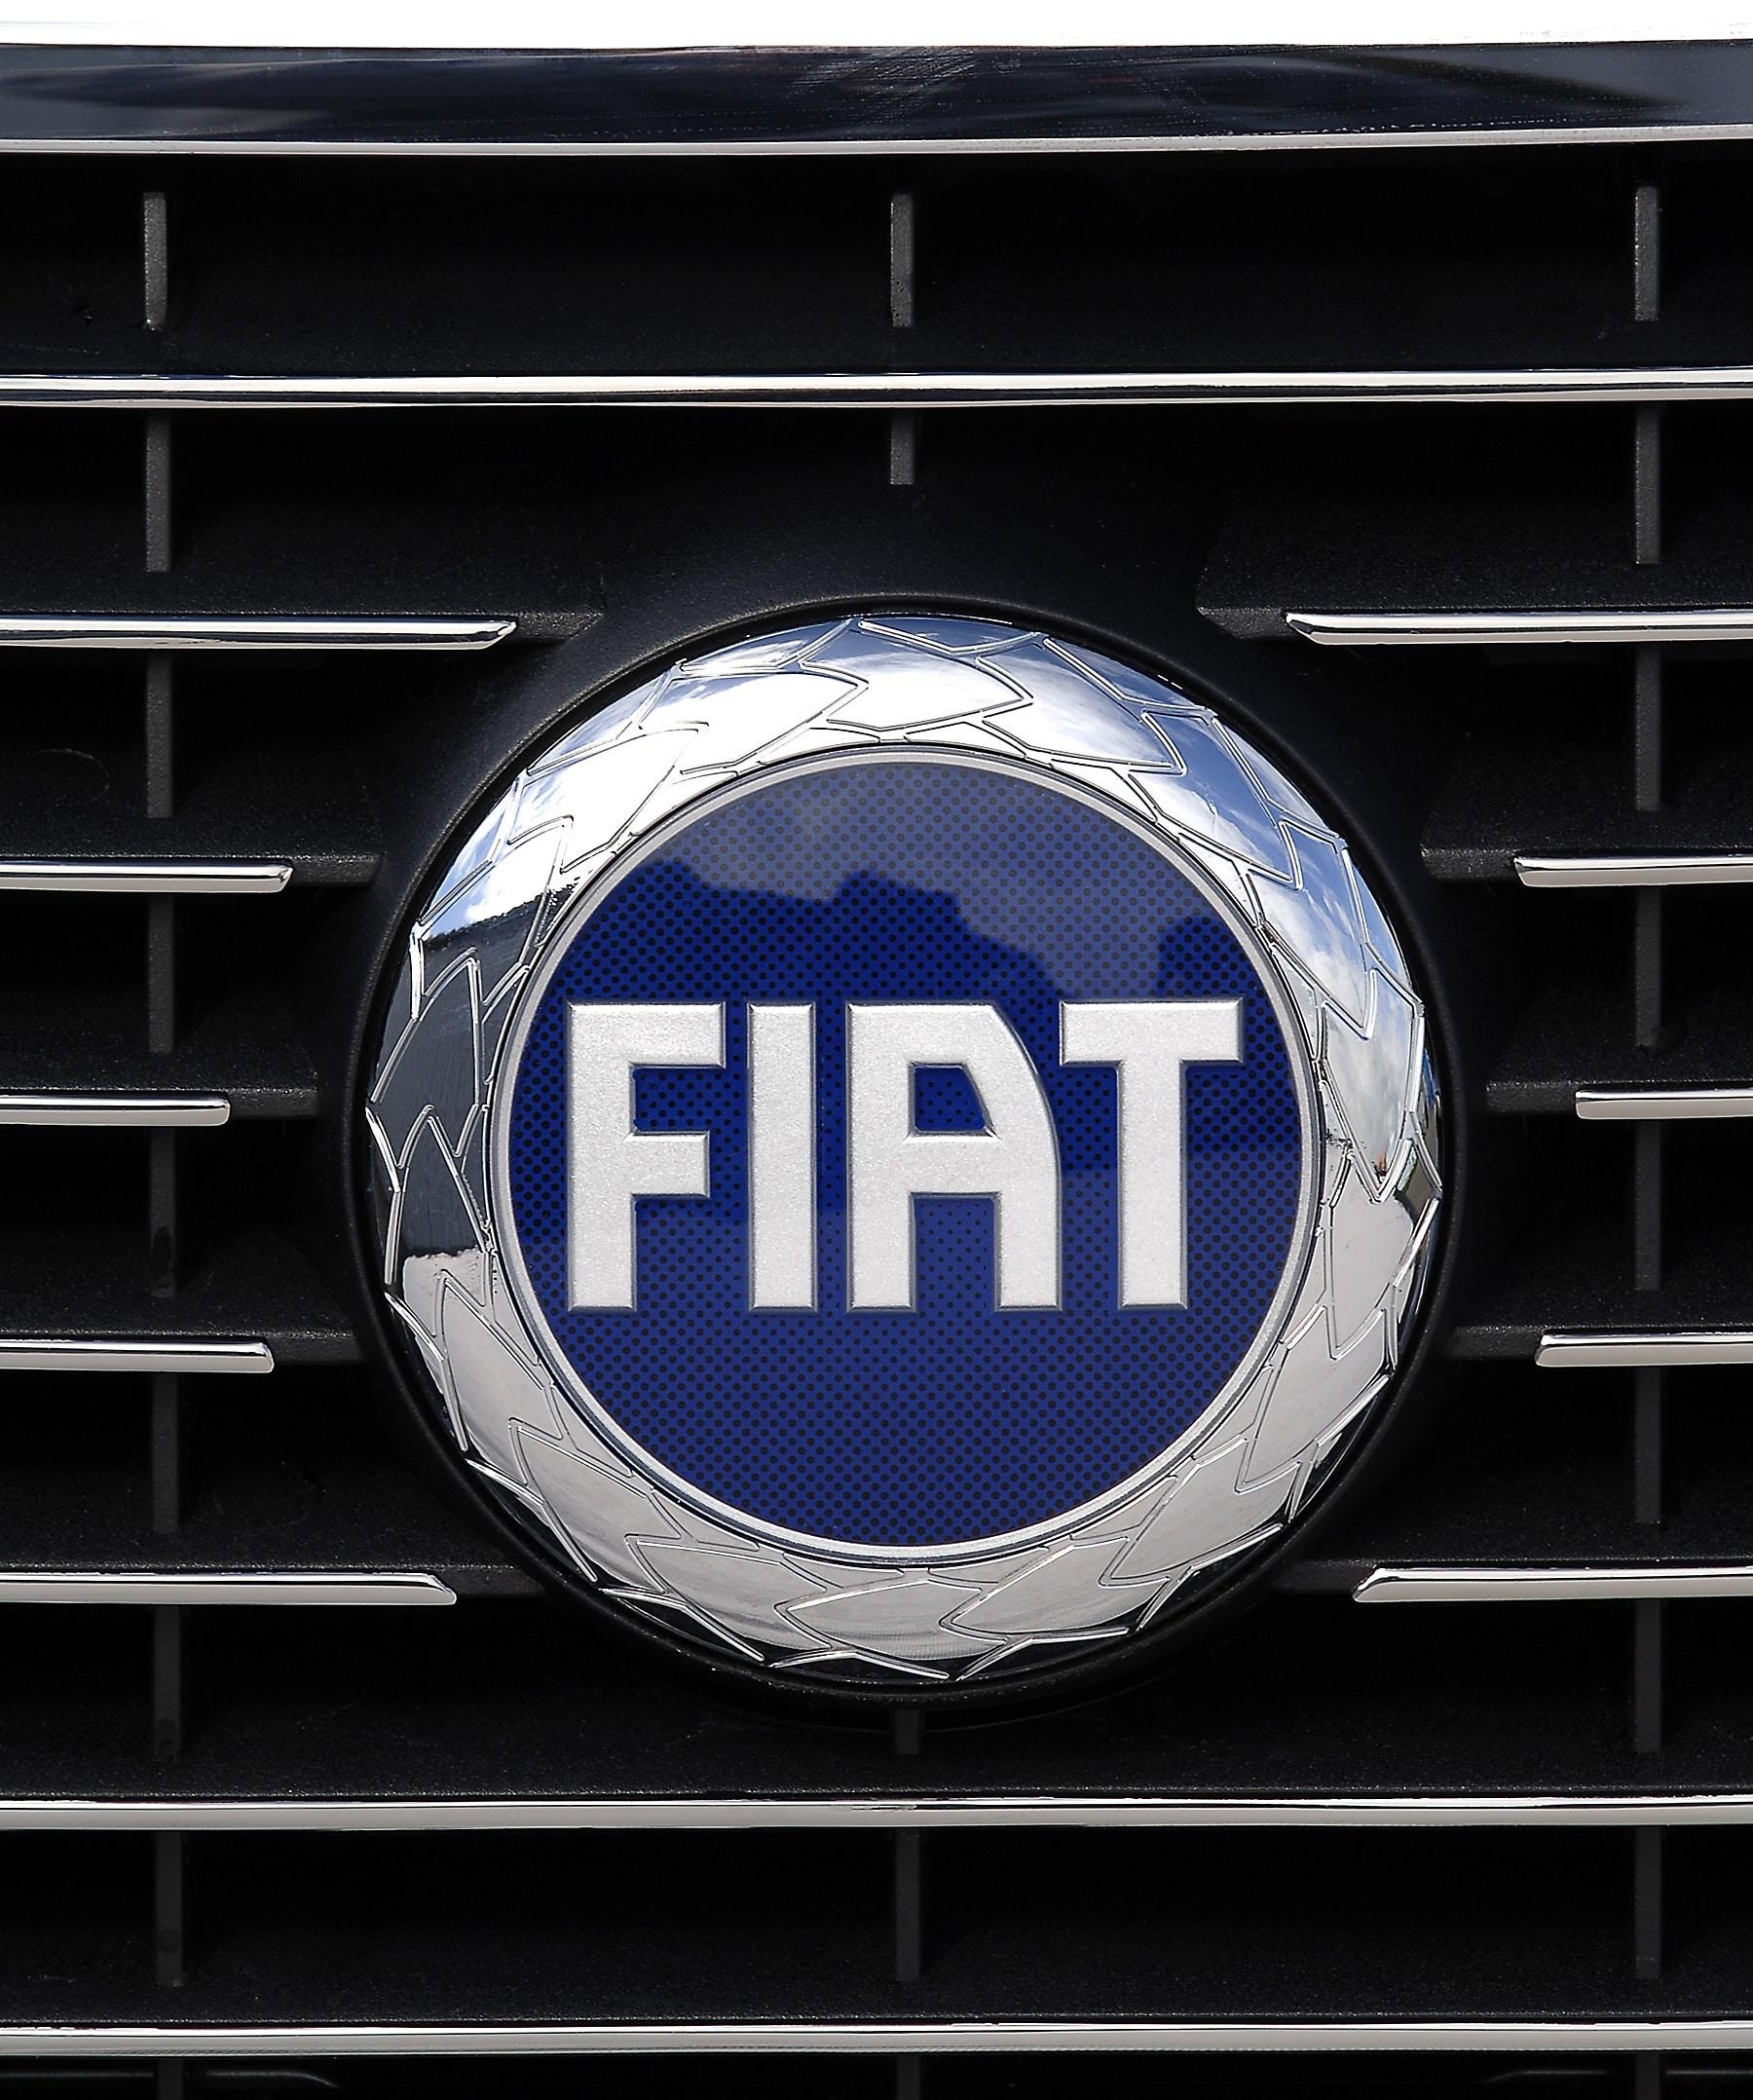 fiat croma, fiat, croma, estate car, mpv, italian car, practical car, bargain car, motoring, automotive, cars, car, ebay motors, ebay, autotrader